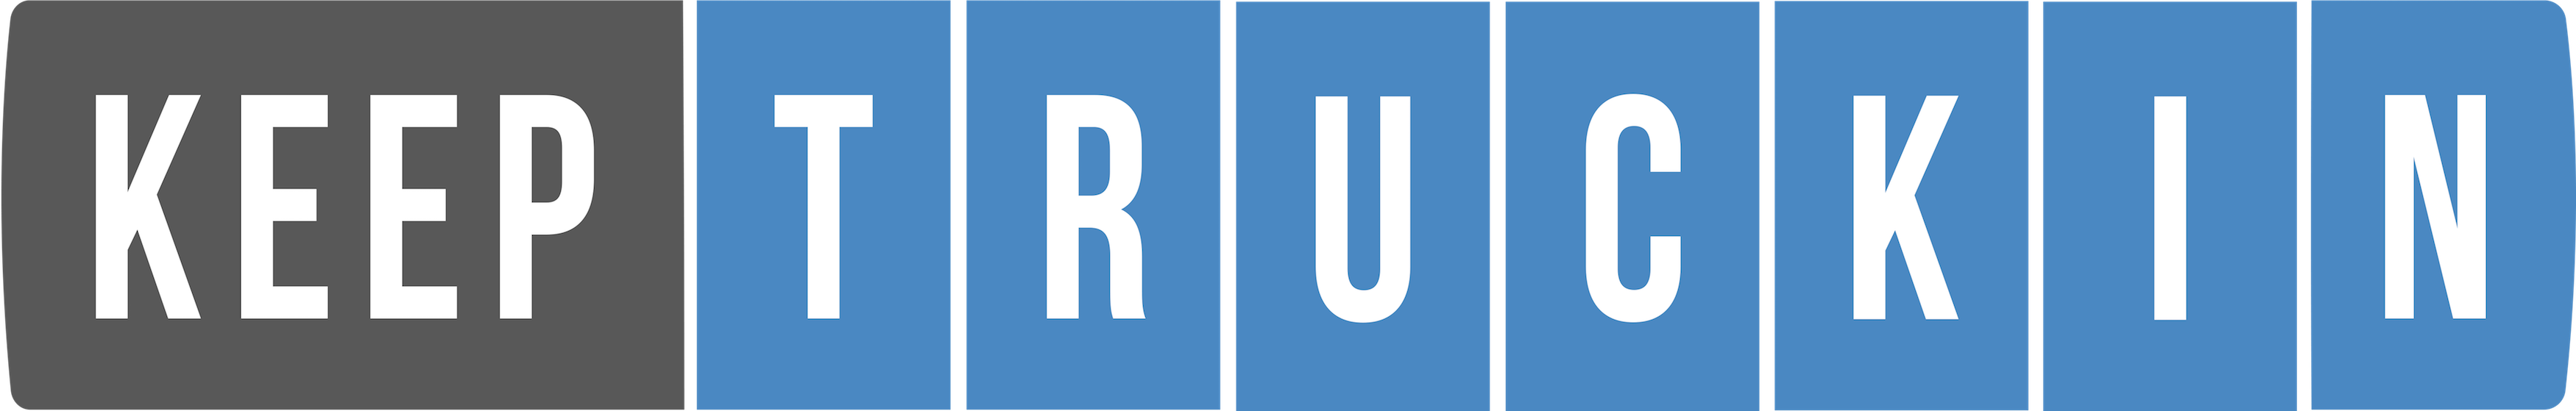 keeptruckin-logo-full_3500x